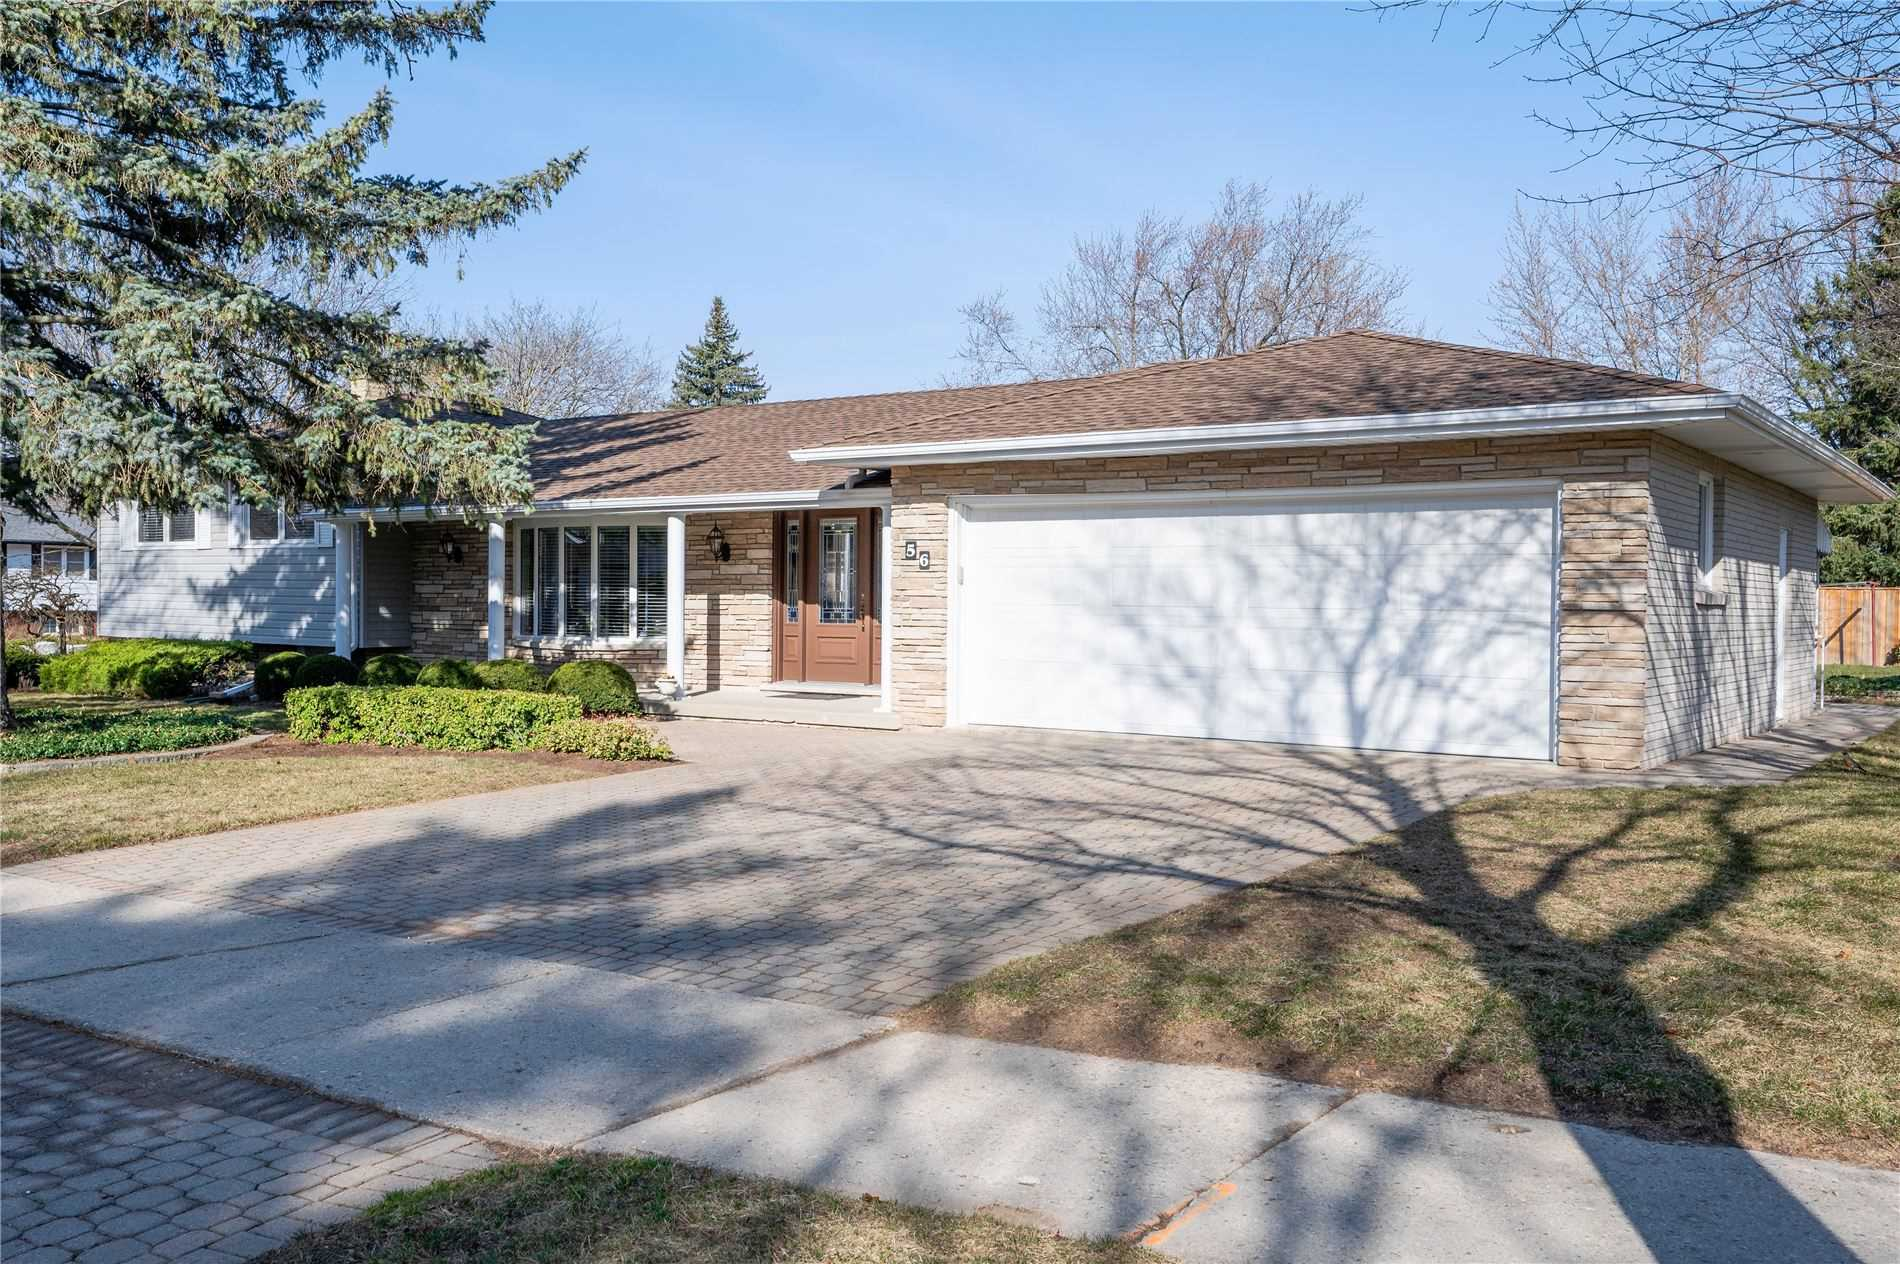 56 Kenora St, Kitchener, Ontario N2A 2B8, 3 Bedrooms Bedrooms, ,3 BathroomsBathrooms,Detached,For Sale,Kenora,X5178122